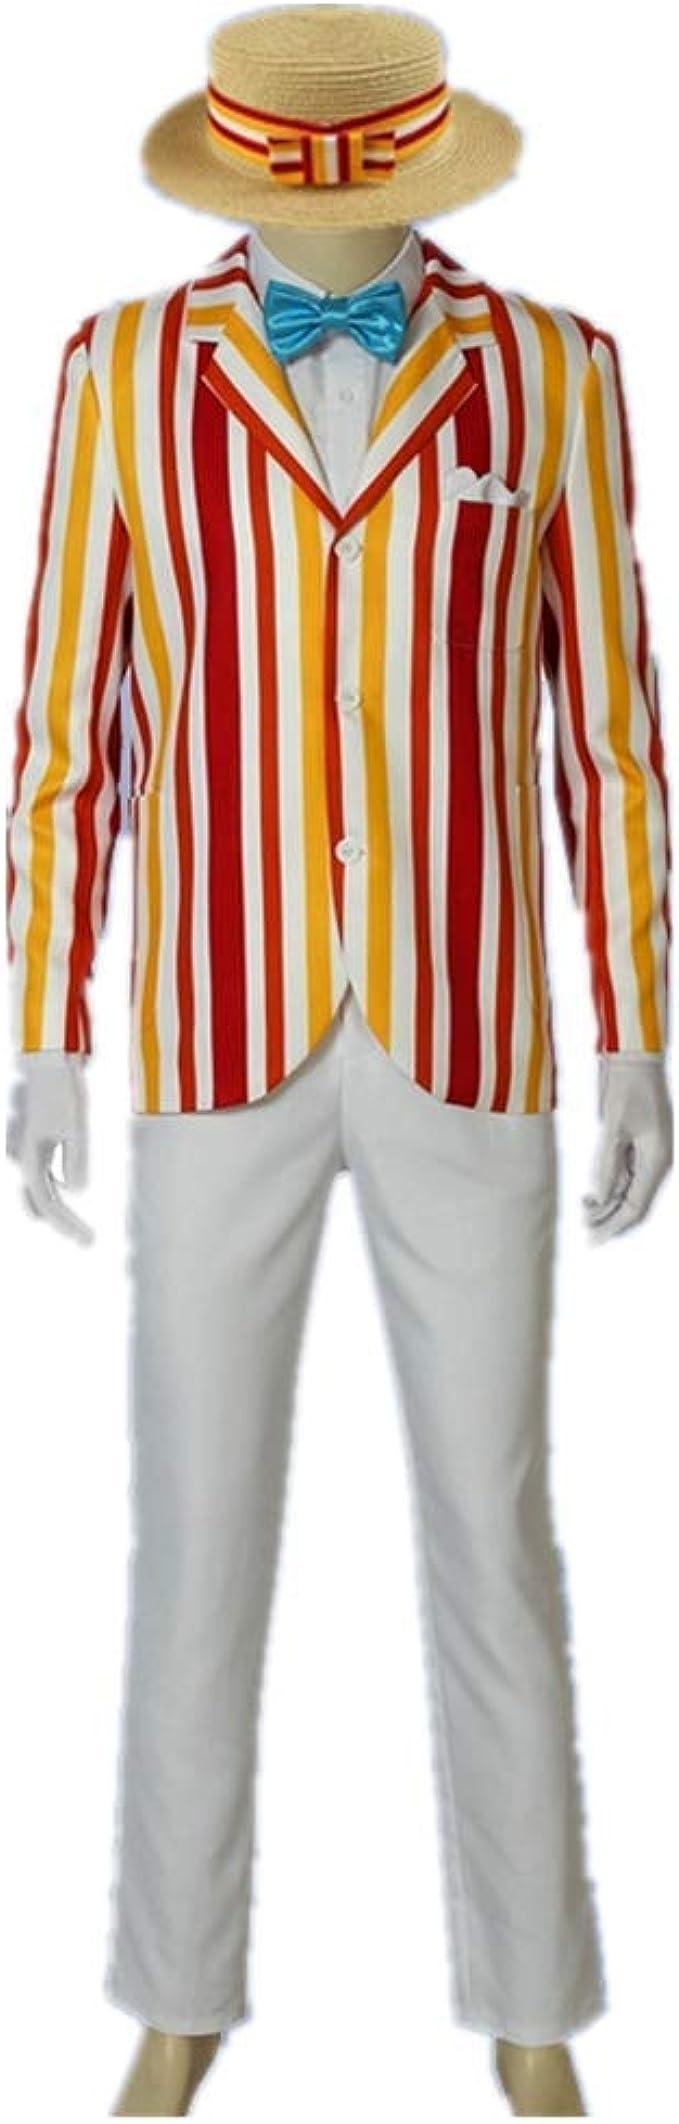 Disfraz de Bert de Mary Poppins para Cosplay, Disfraz Unisex Large ...